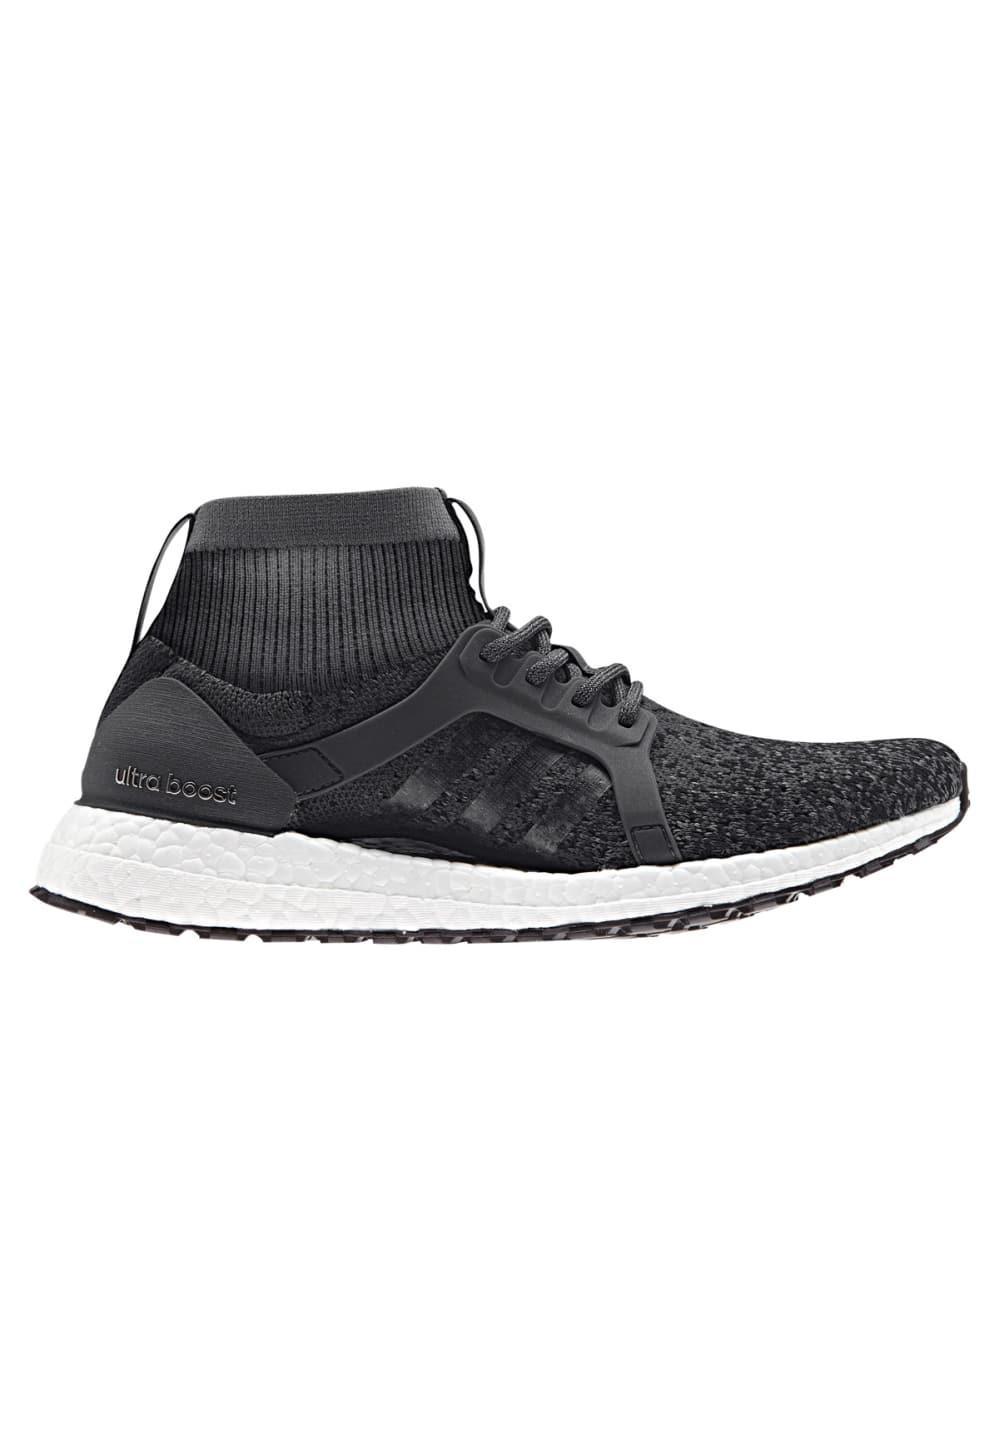 adidas Ultra Boost X All Terrain - Laufschuhe für Damen - Schwarz